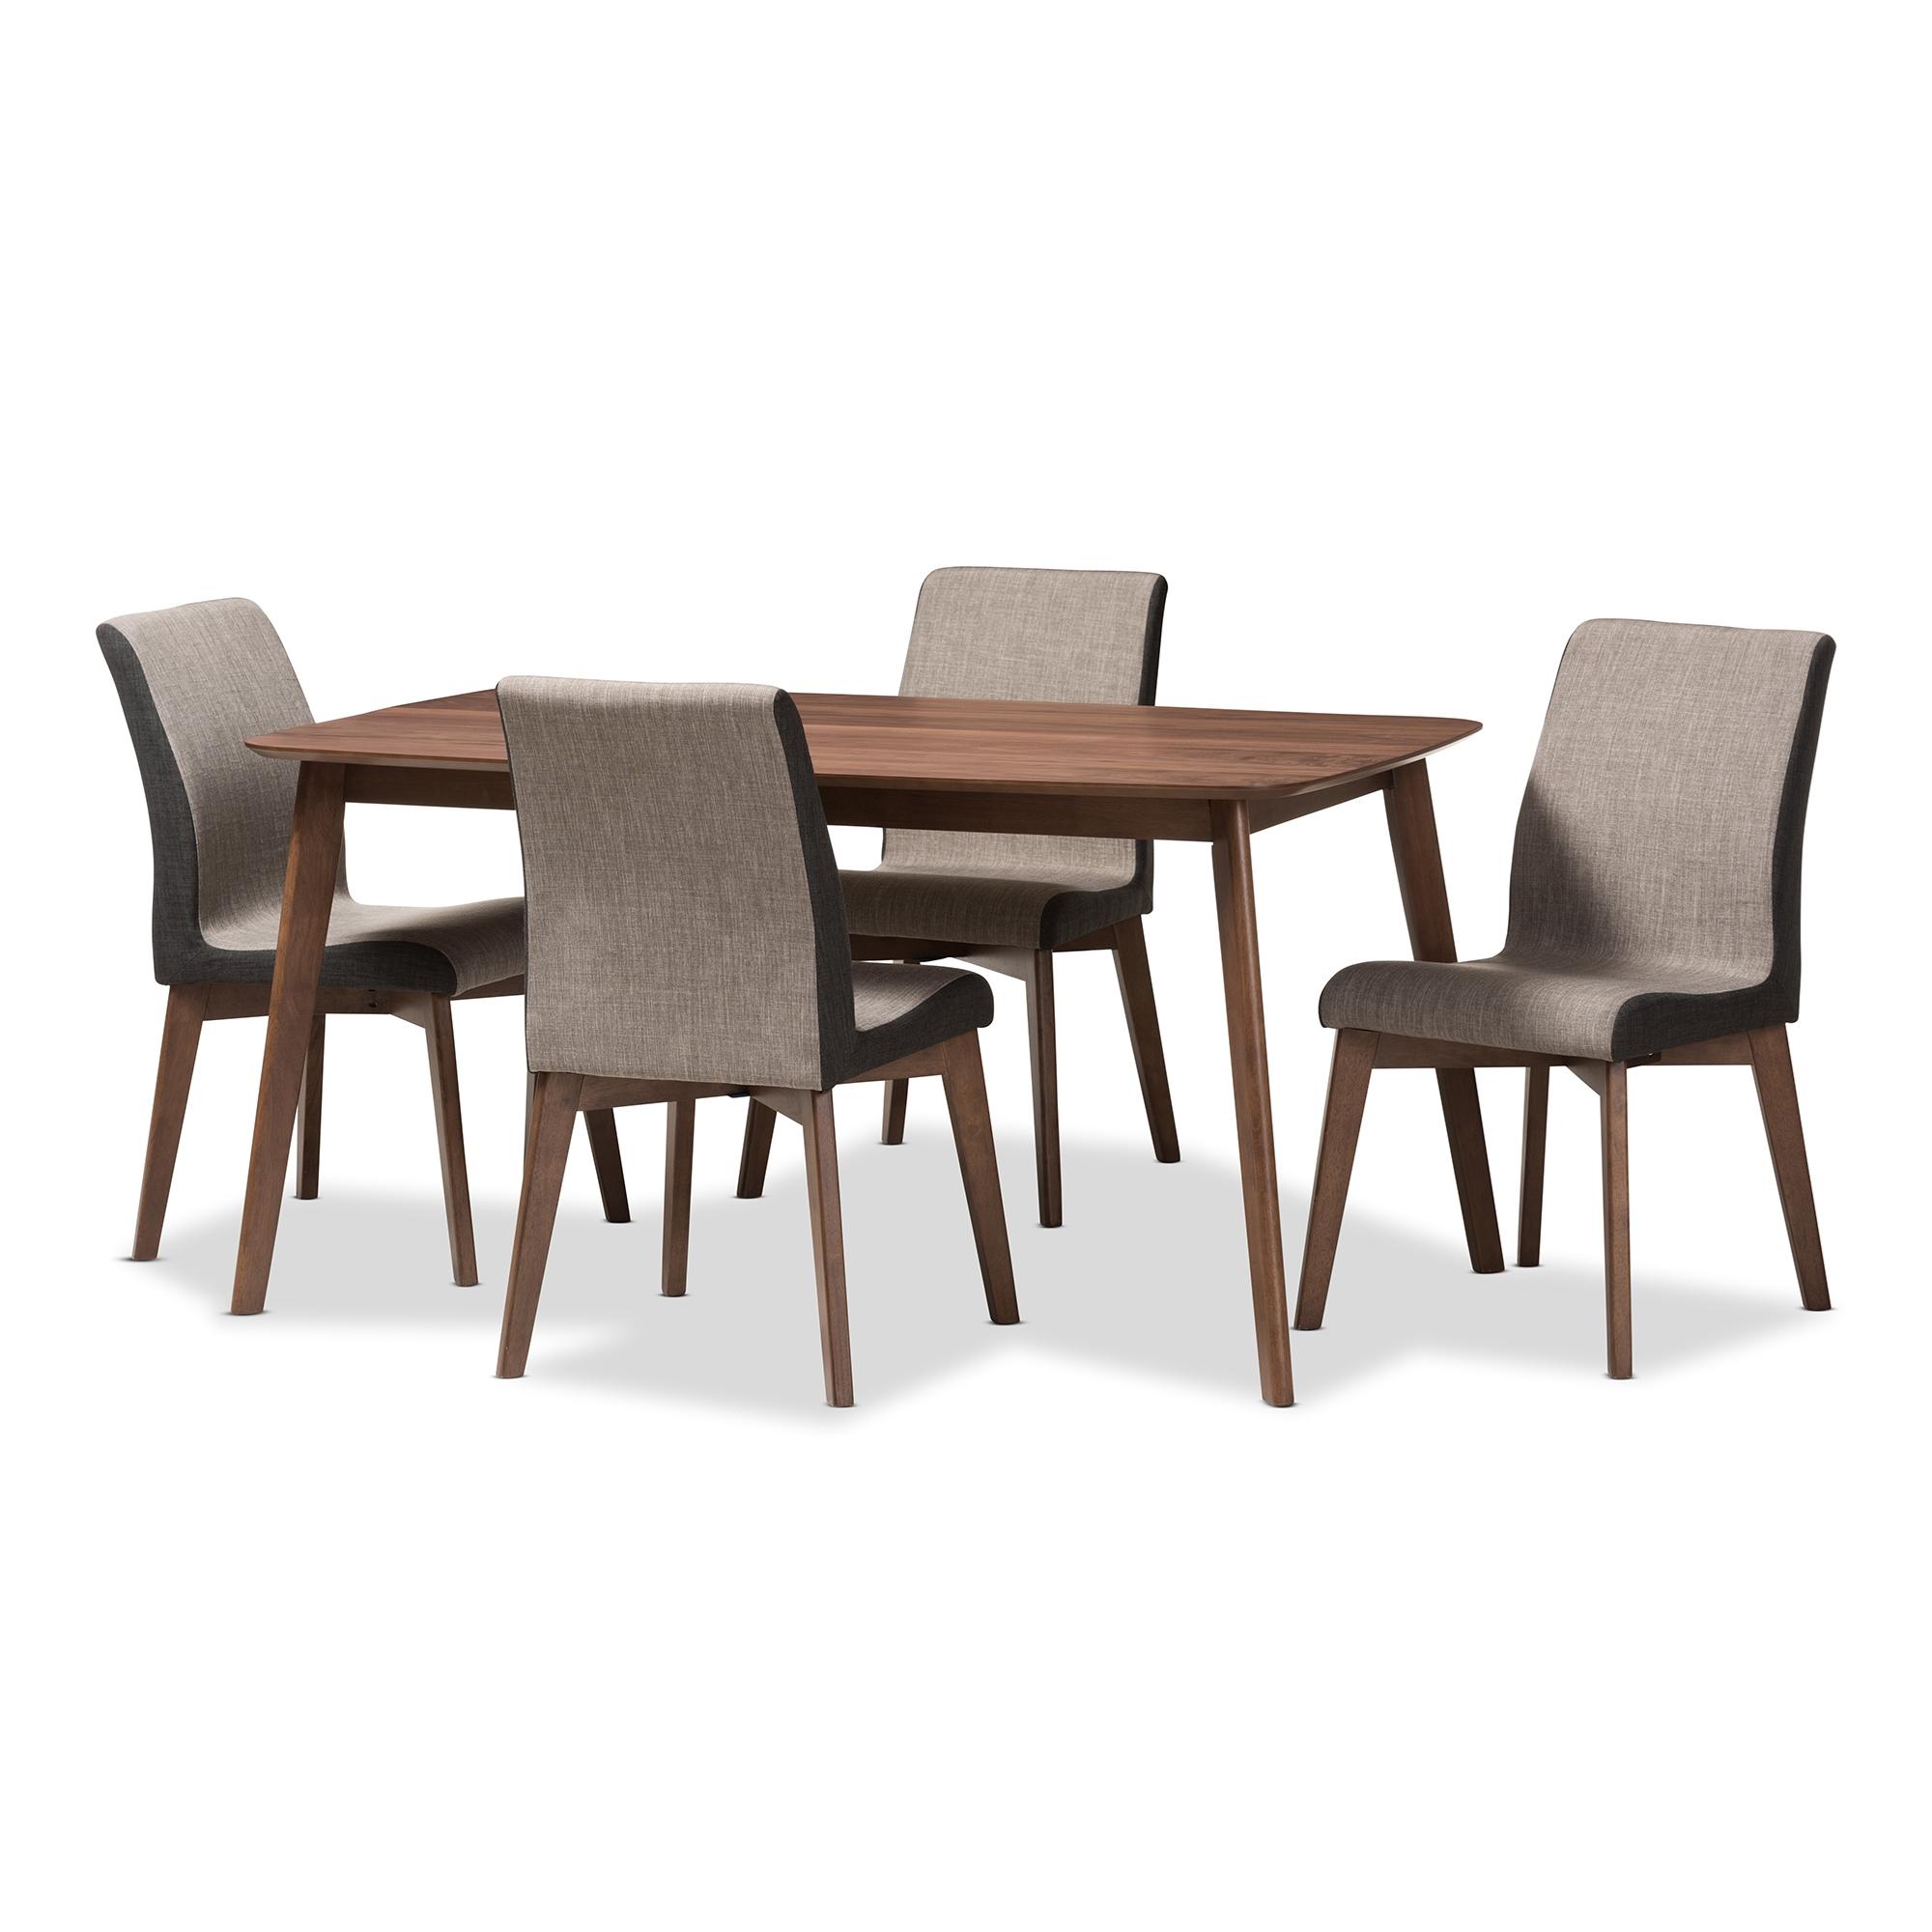 Baxton Studio Kimberly Mid Century Modern Beige And Brown Fabric 5 Piece  Dining Set